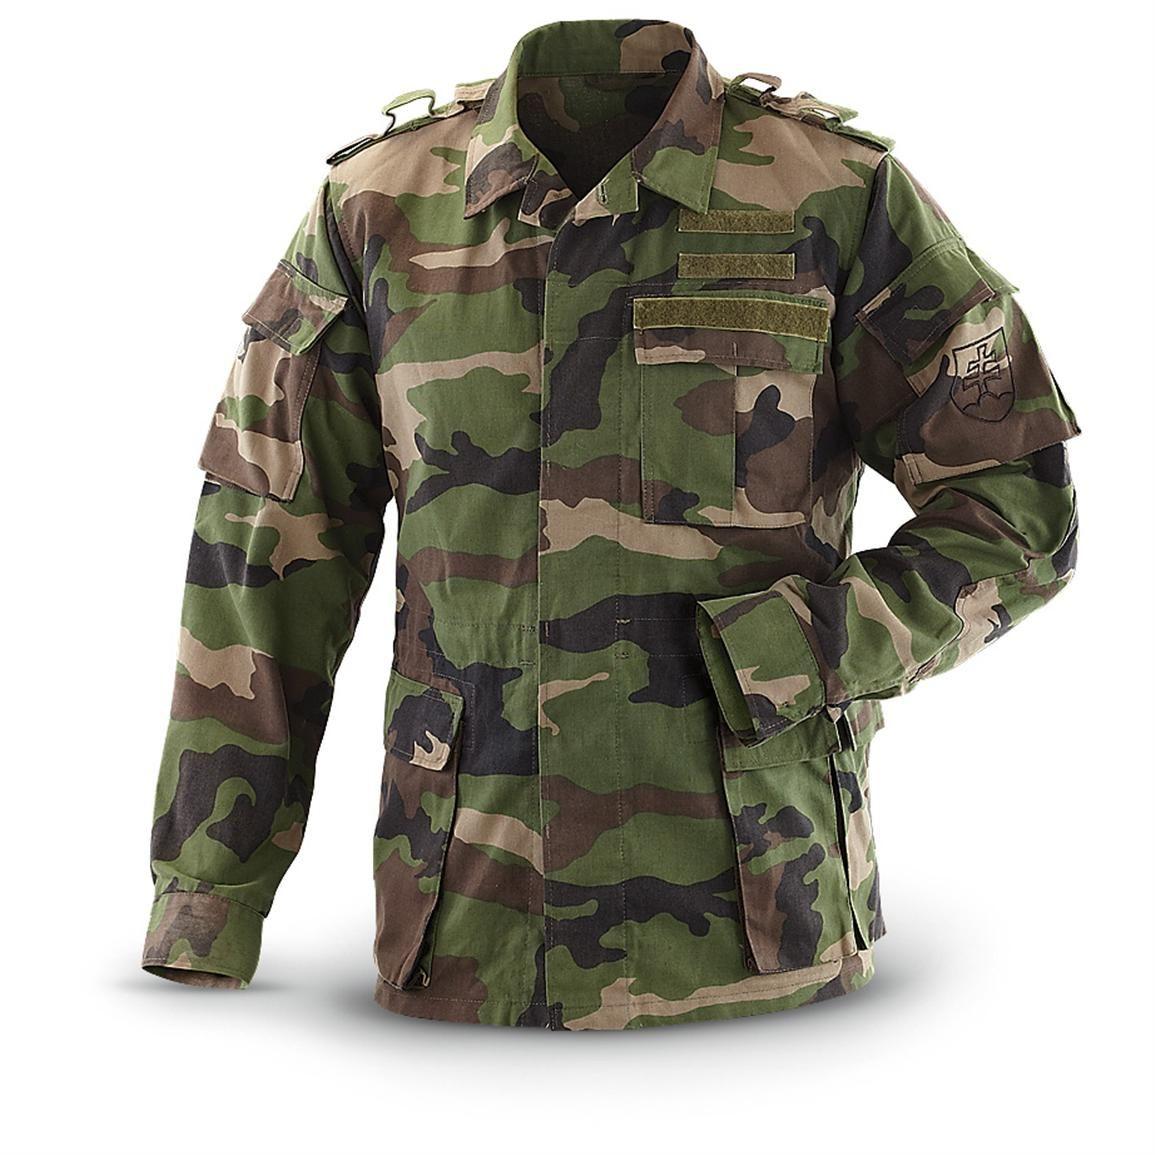 Vintage mILITARY Jacket Camo Lightweight Military SurplusCoat Camouflage Jacket Grösse 8 Size Medium CiYoxjDxf